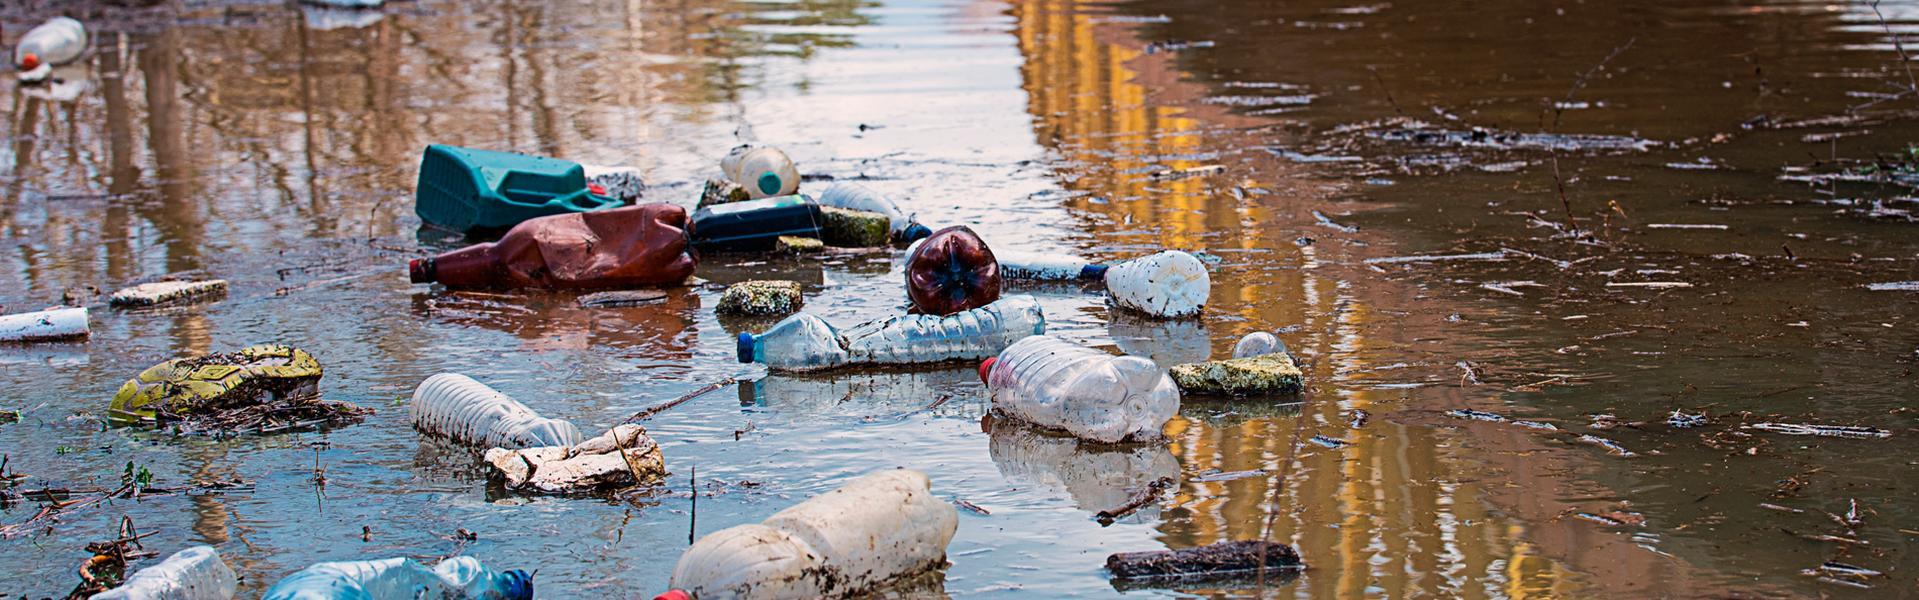 river bottles